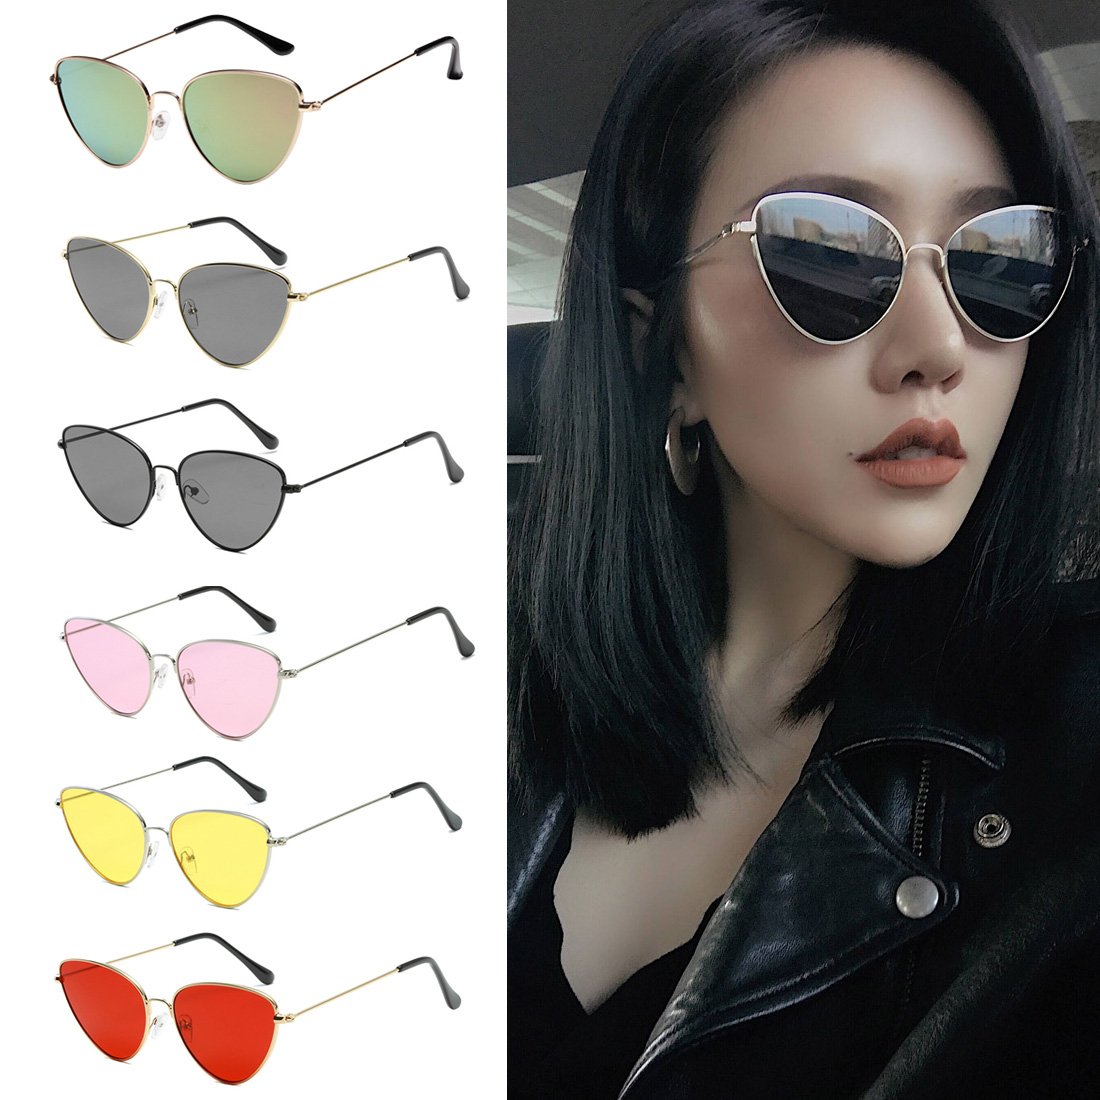 Women Yellow Red Lens Sun glasses Fashion Light Weight Sunglass For Woman Fashionable Joker Retro Cat Eye Sunglasses in Women 39 s Sunglasses from Apparel Accessories